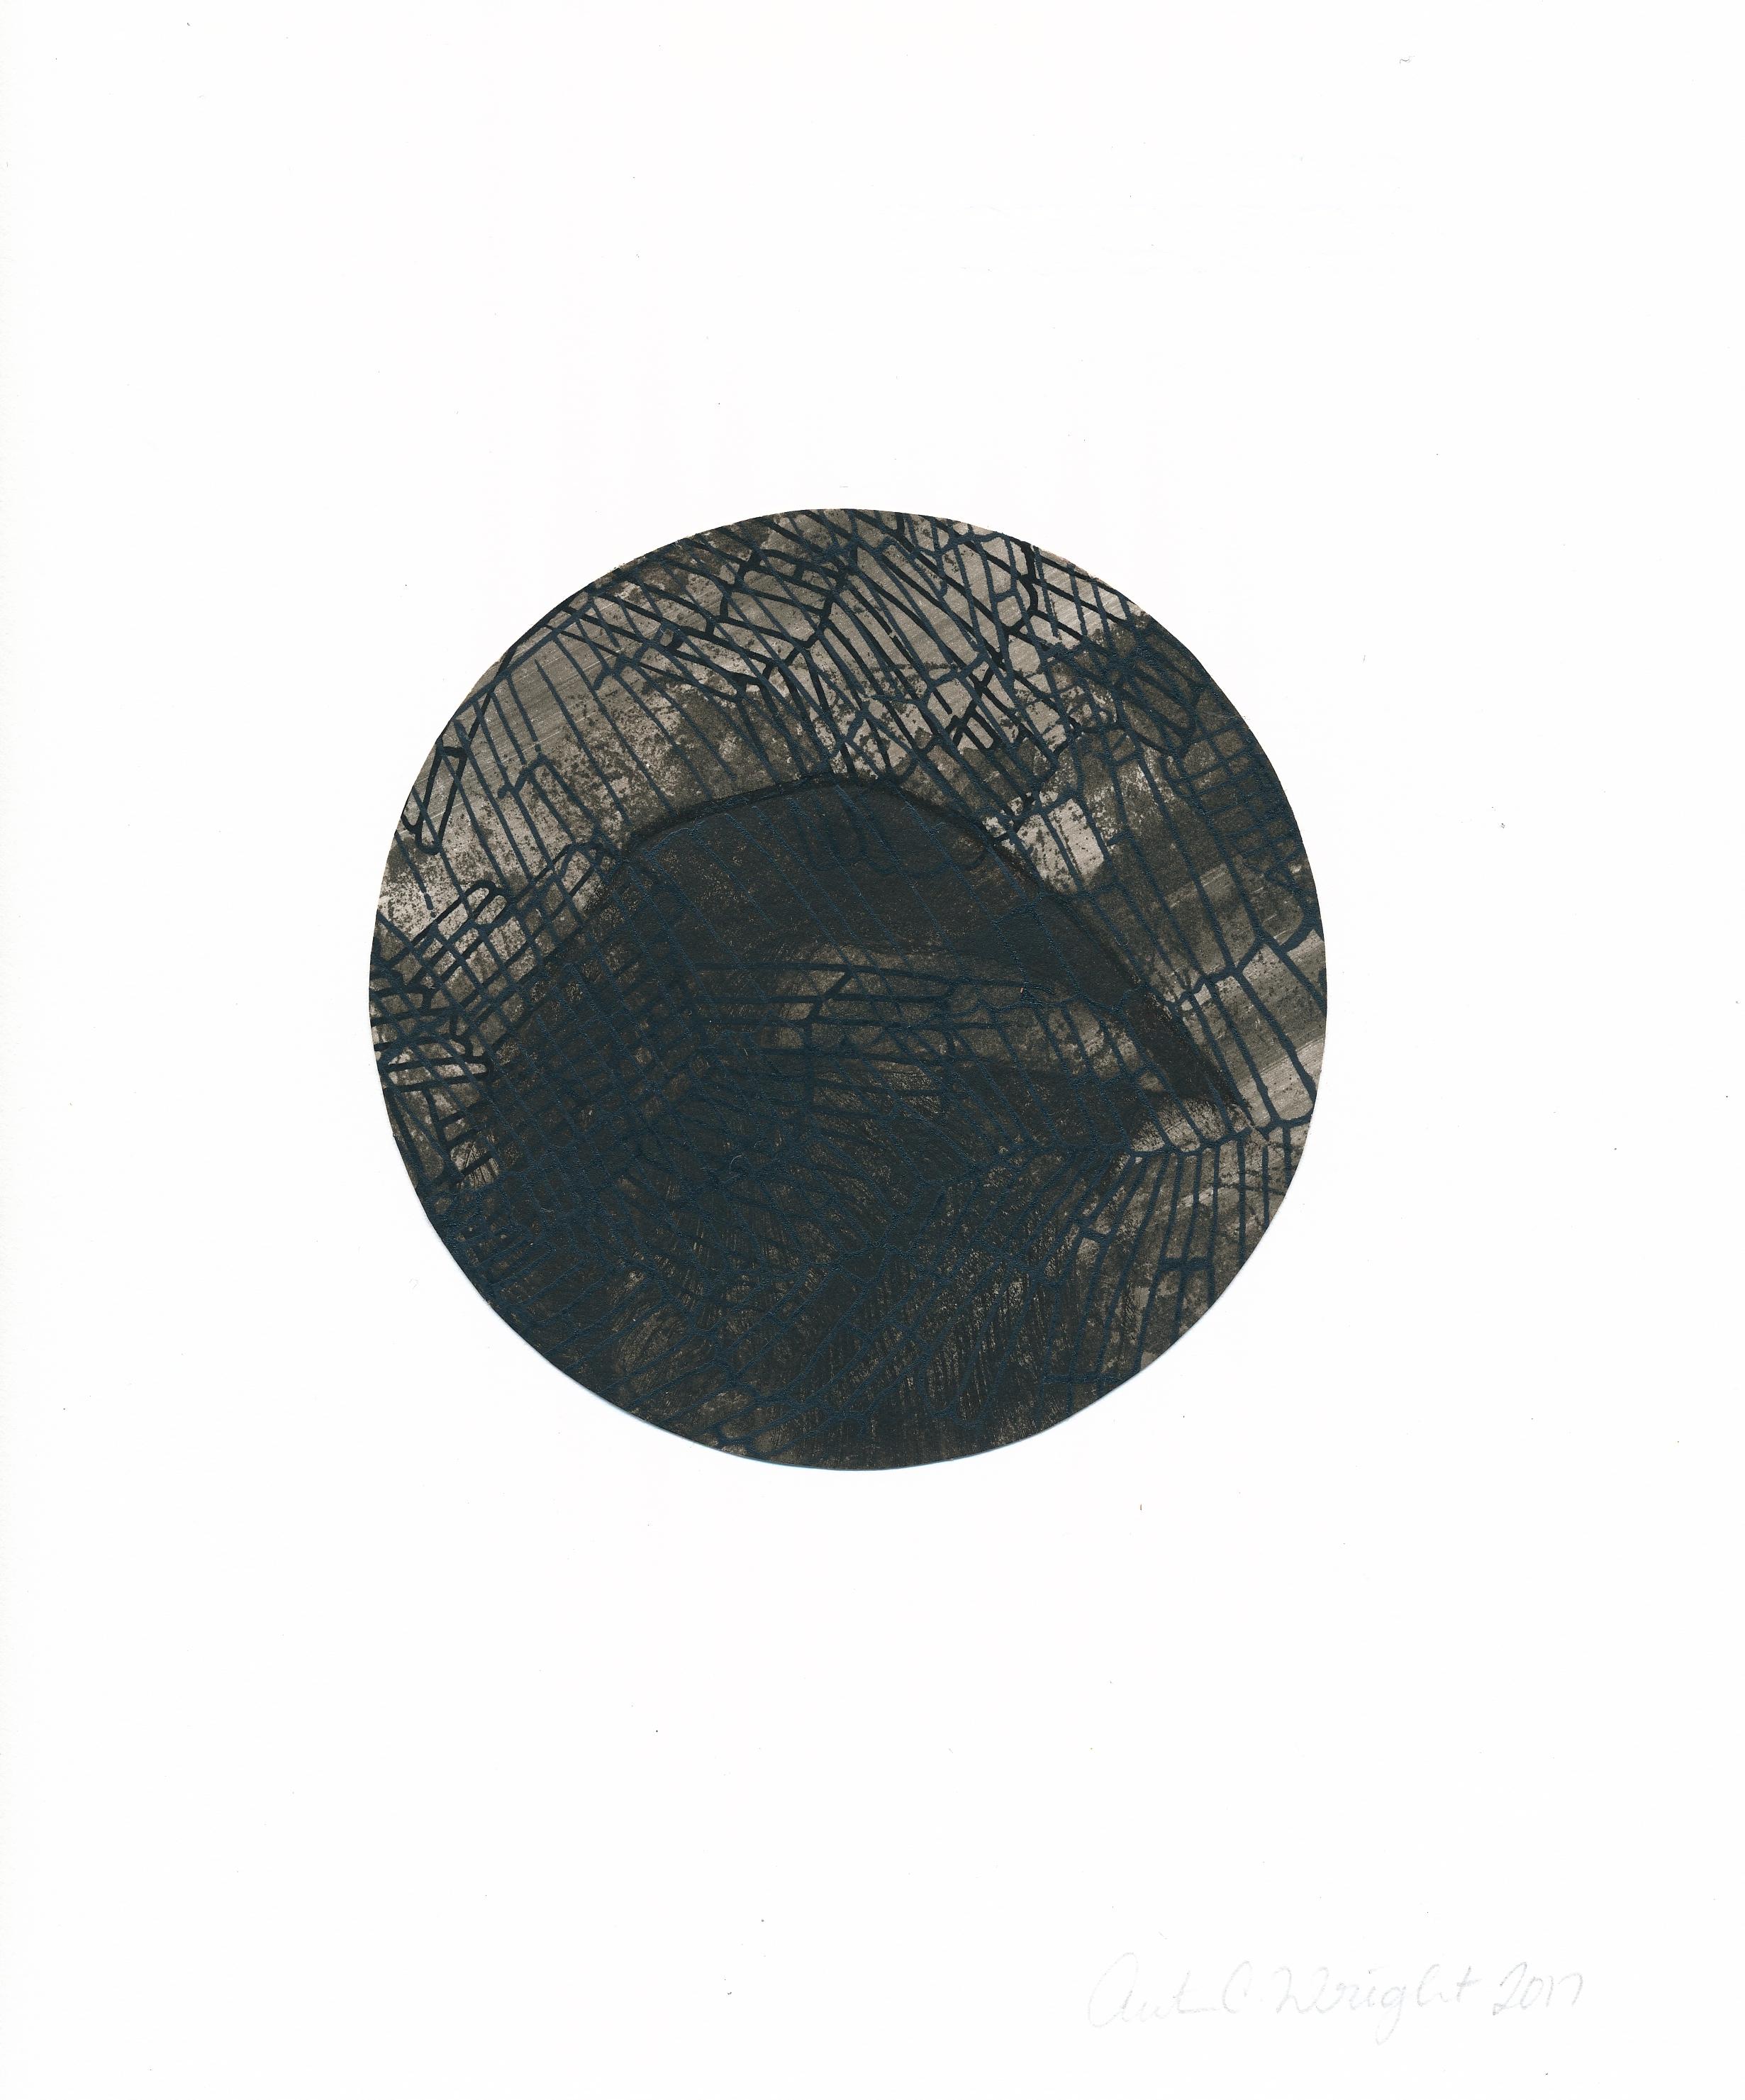 circle179.jpg